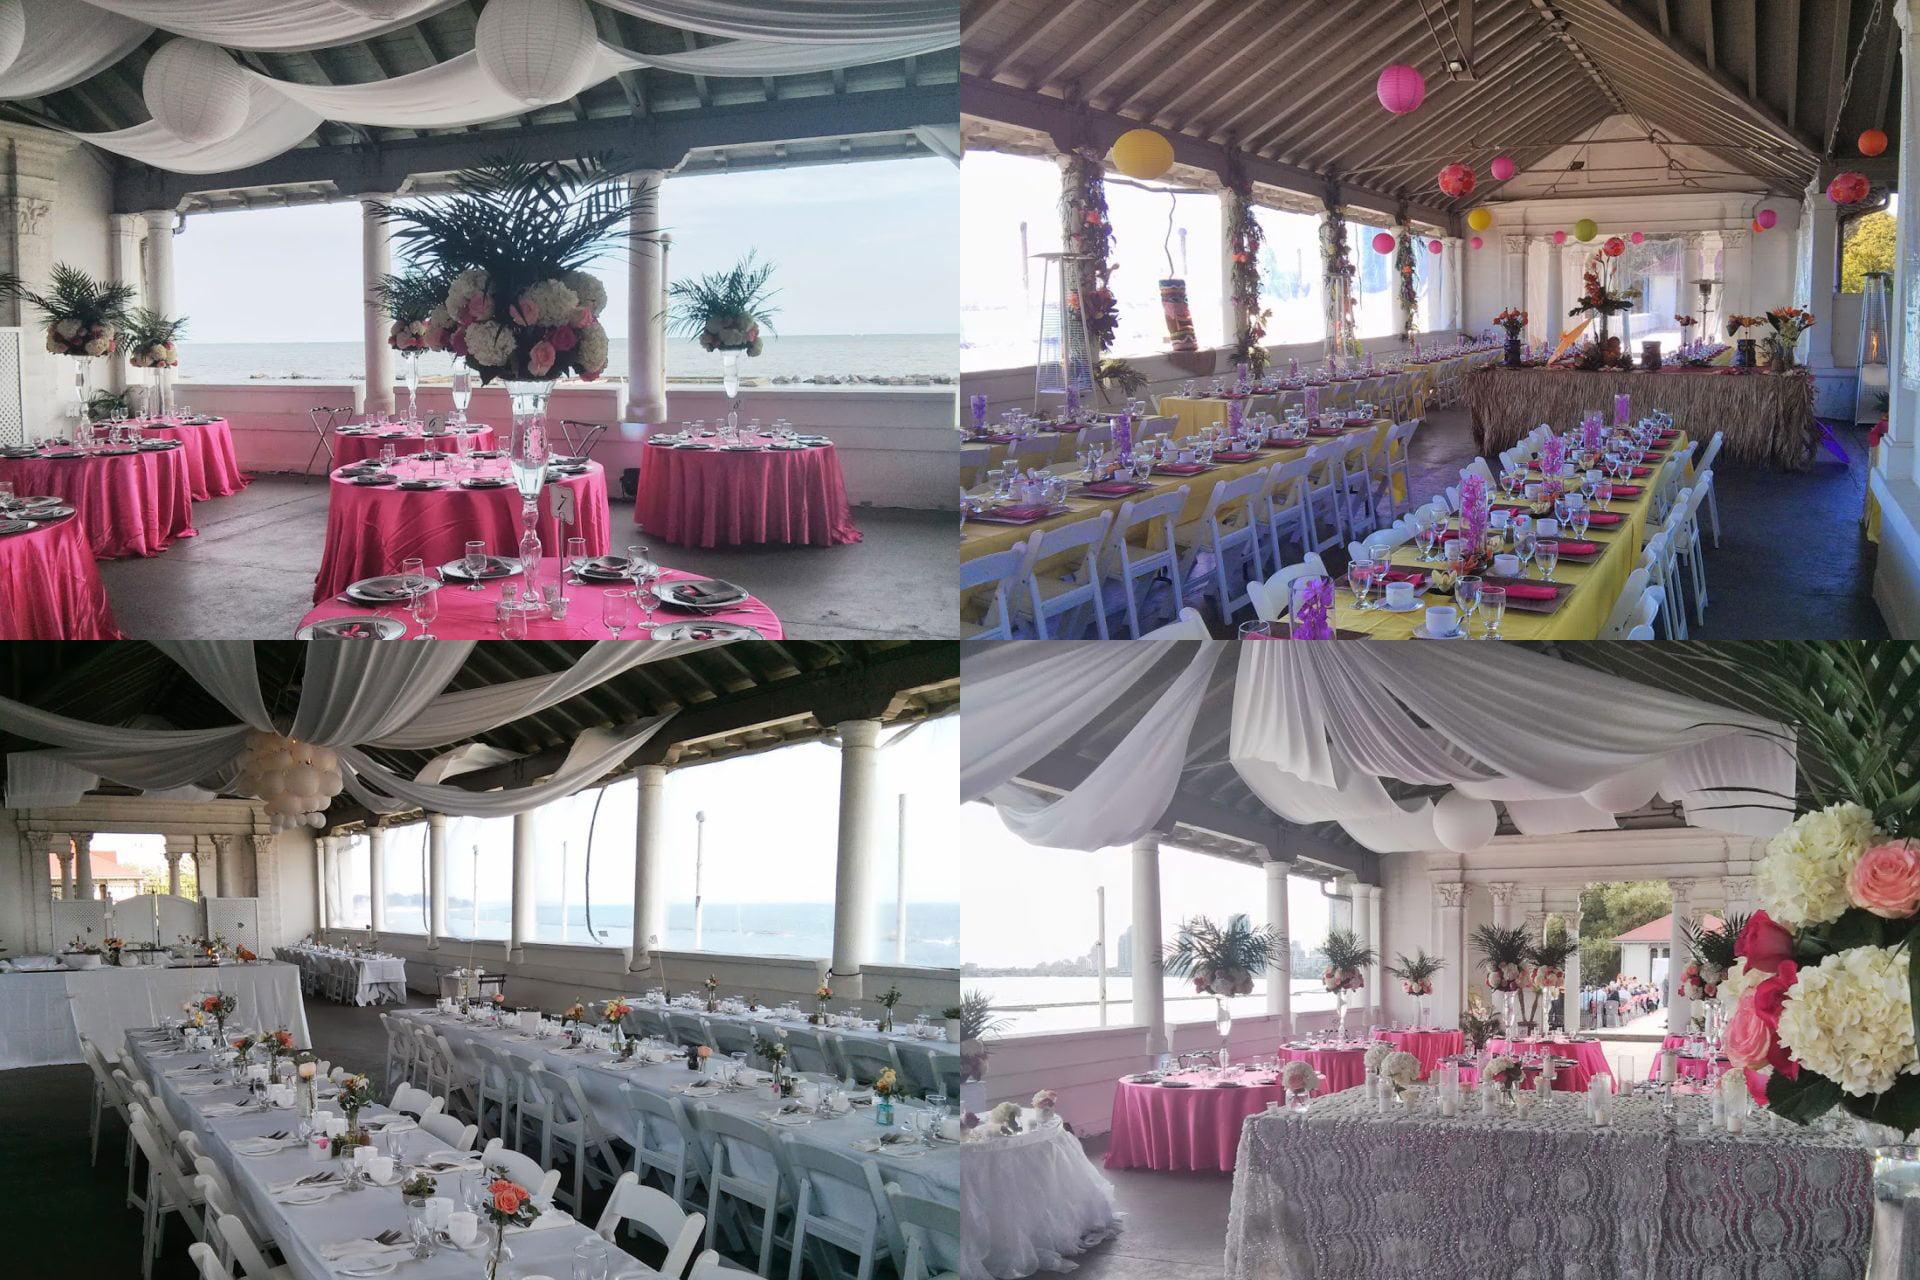 Sunnyside Pavilion